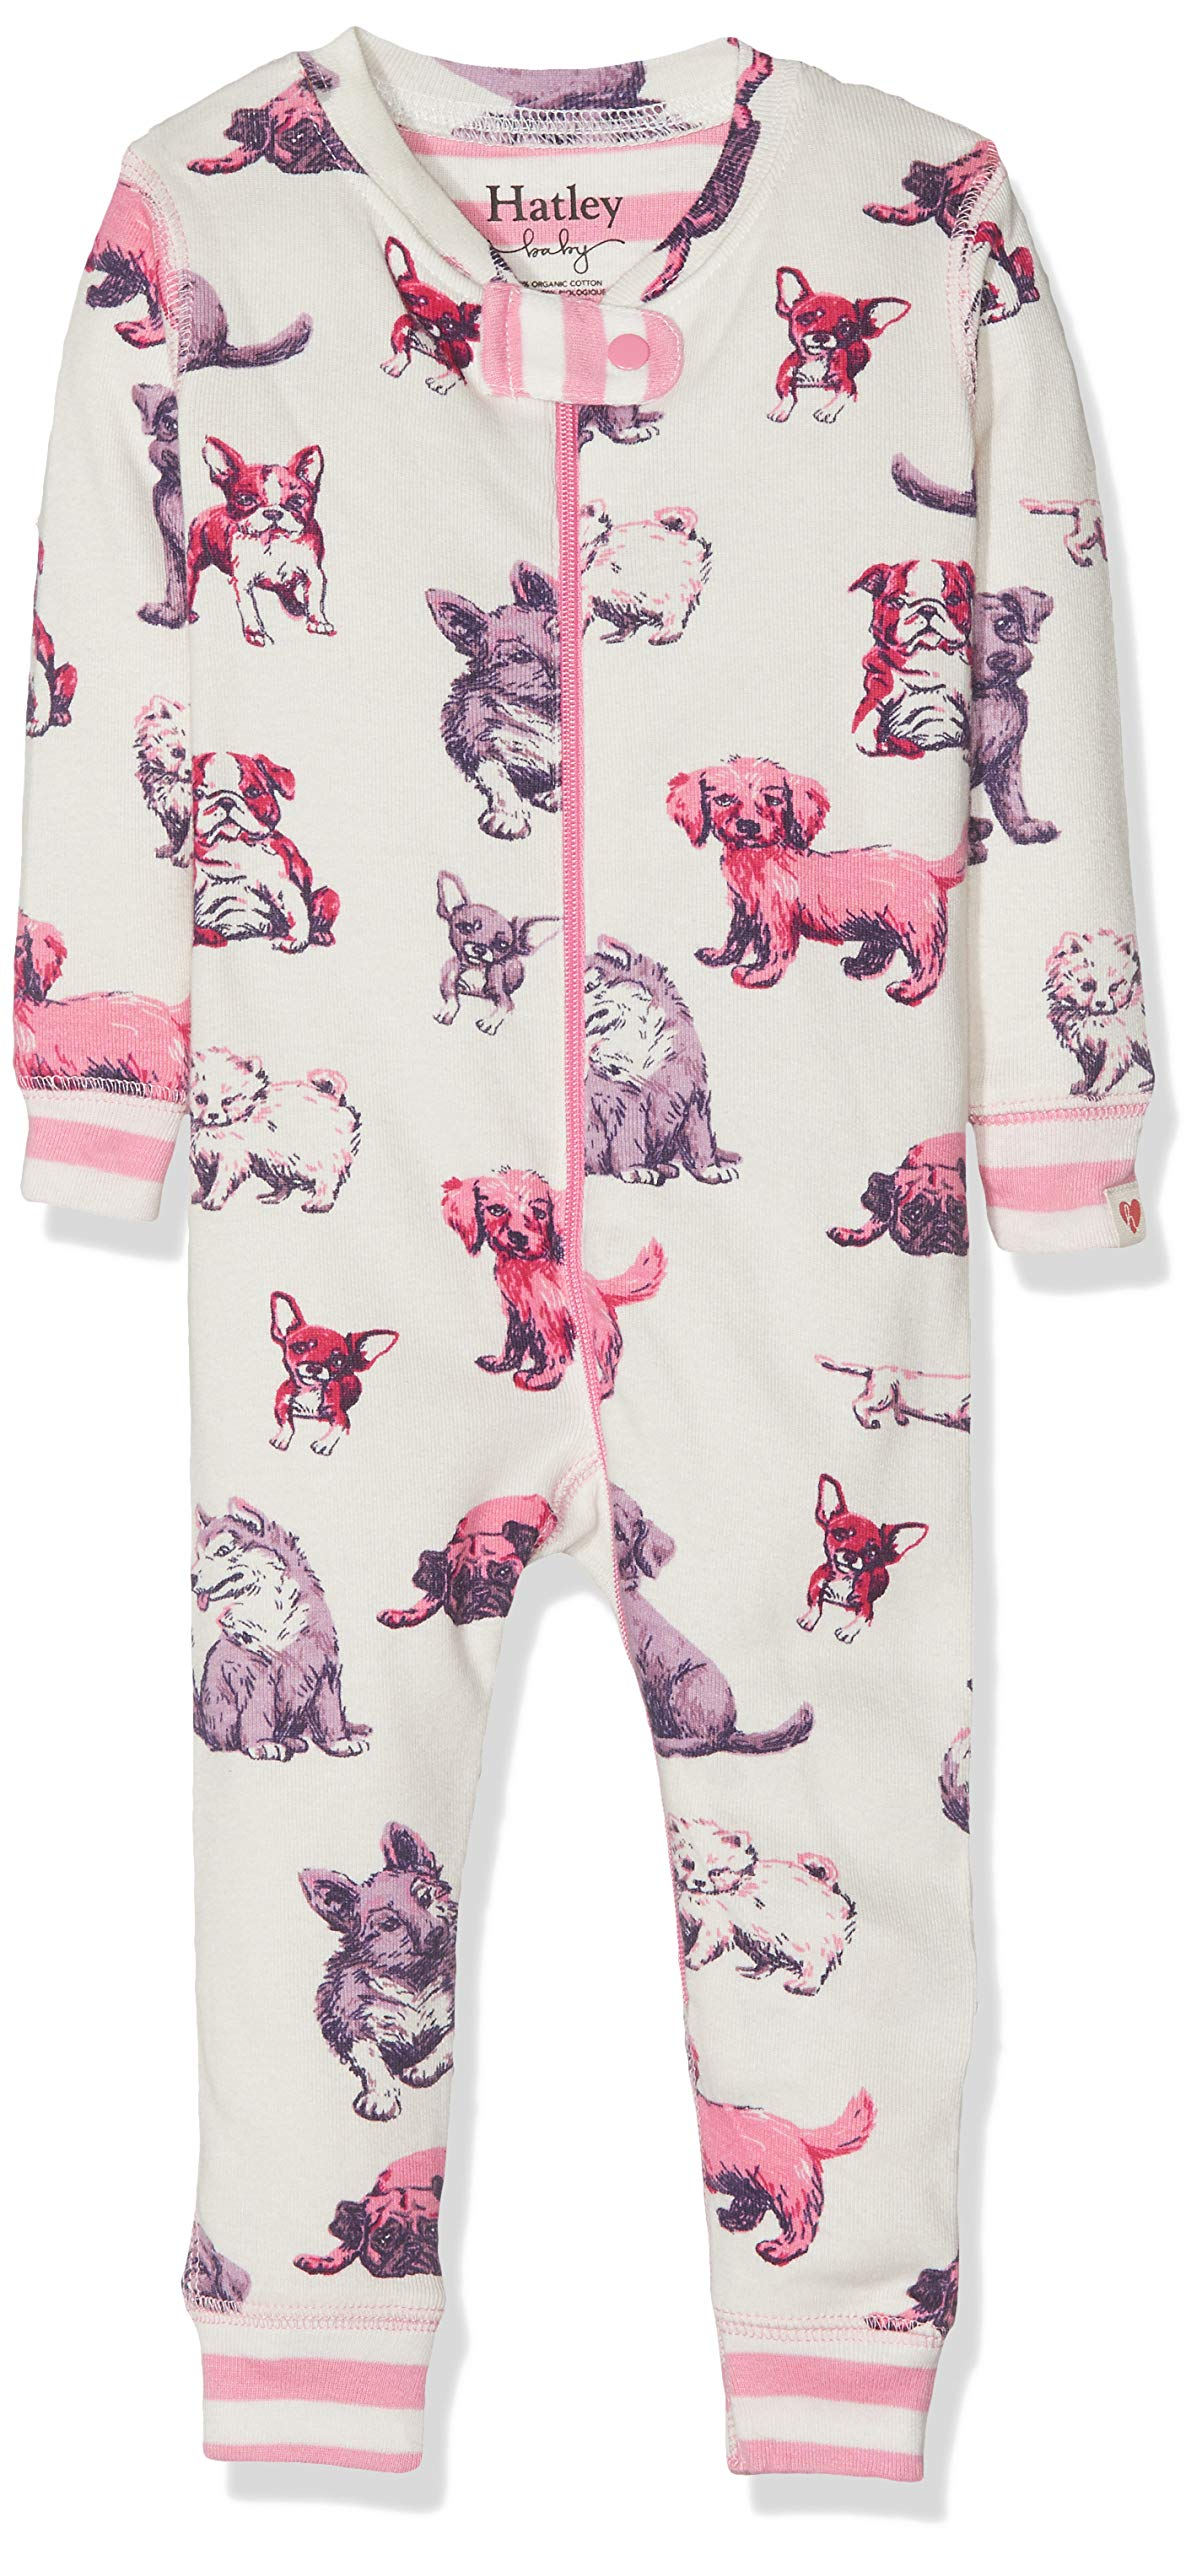 Hatley Organic Cotton Sleepsuits Pelele para Dormir para Bebés 1